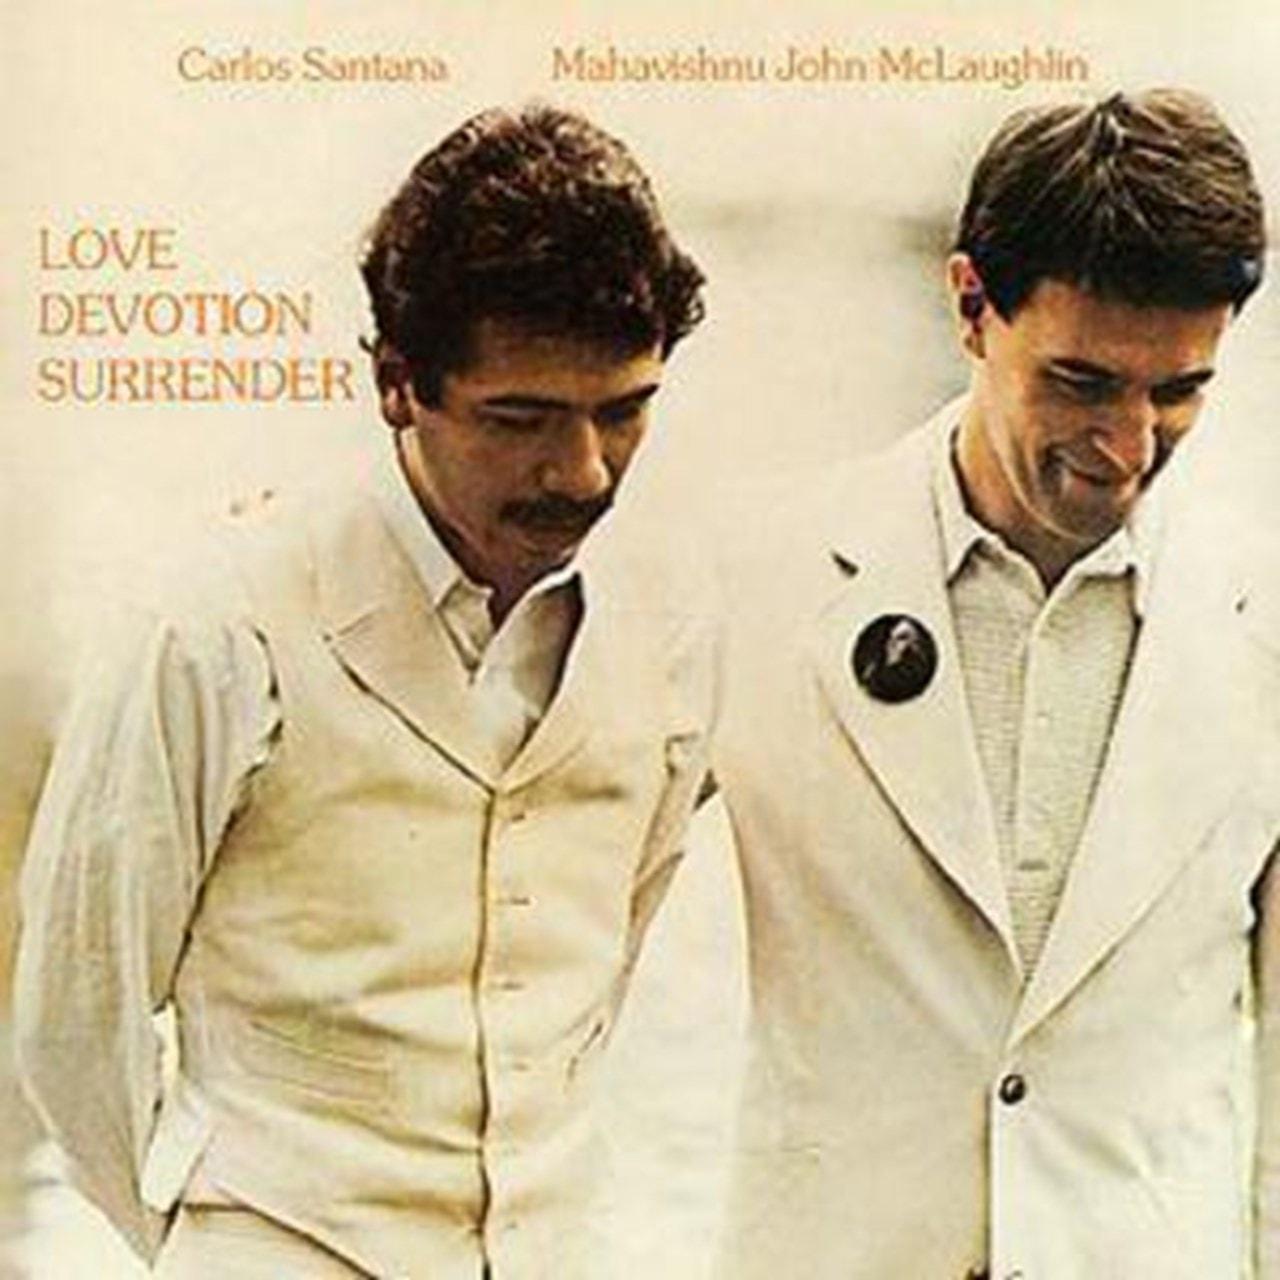 Love Devotion Surrender - 1